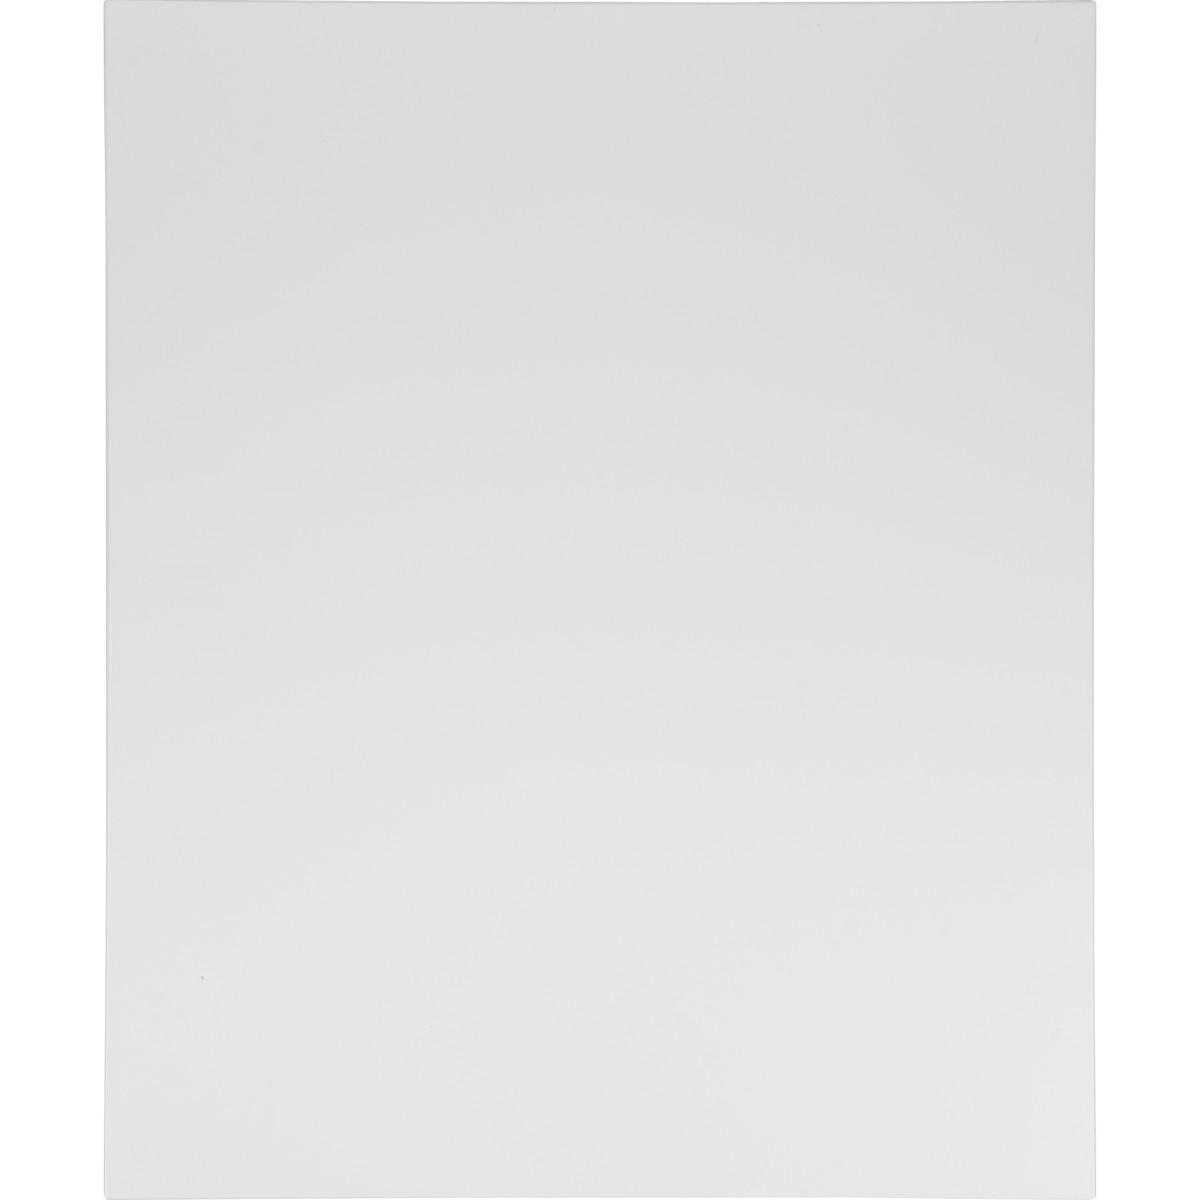 Фальшпанель для шкафа «Леда белая» 58х70 см